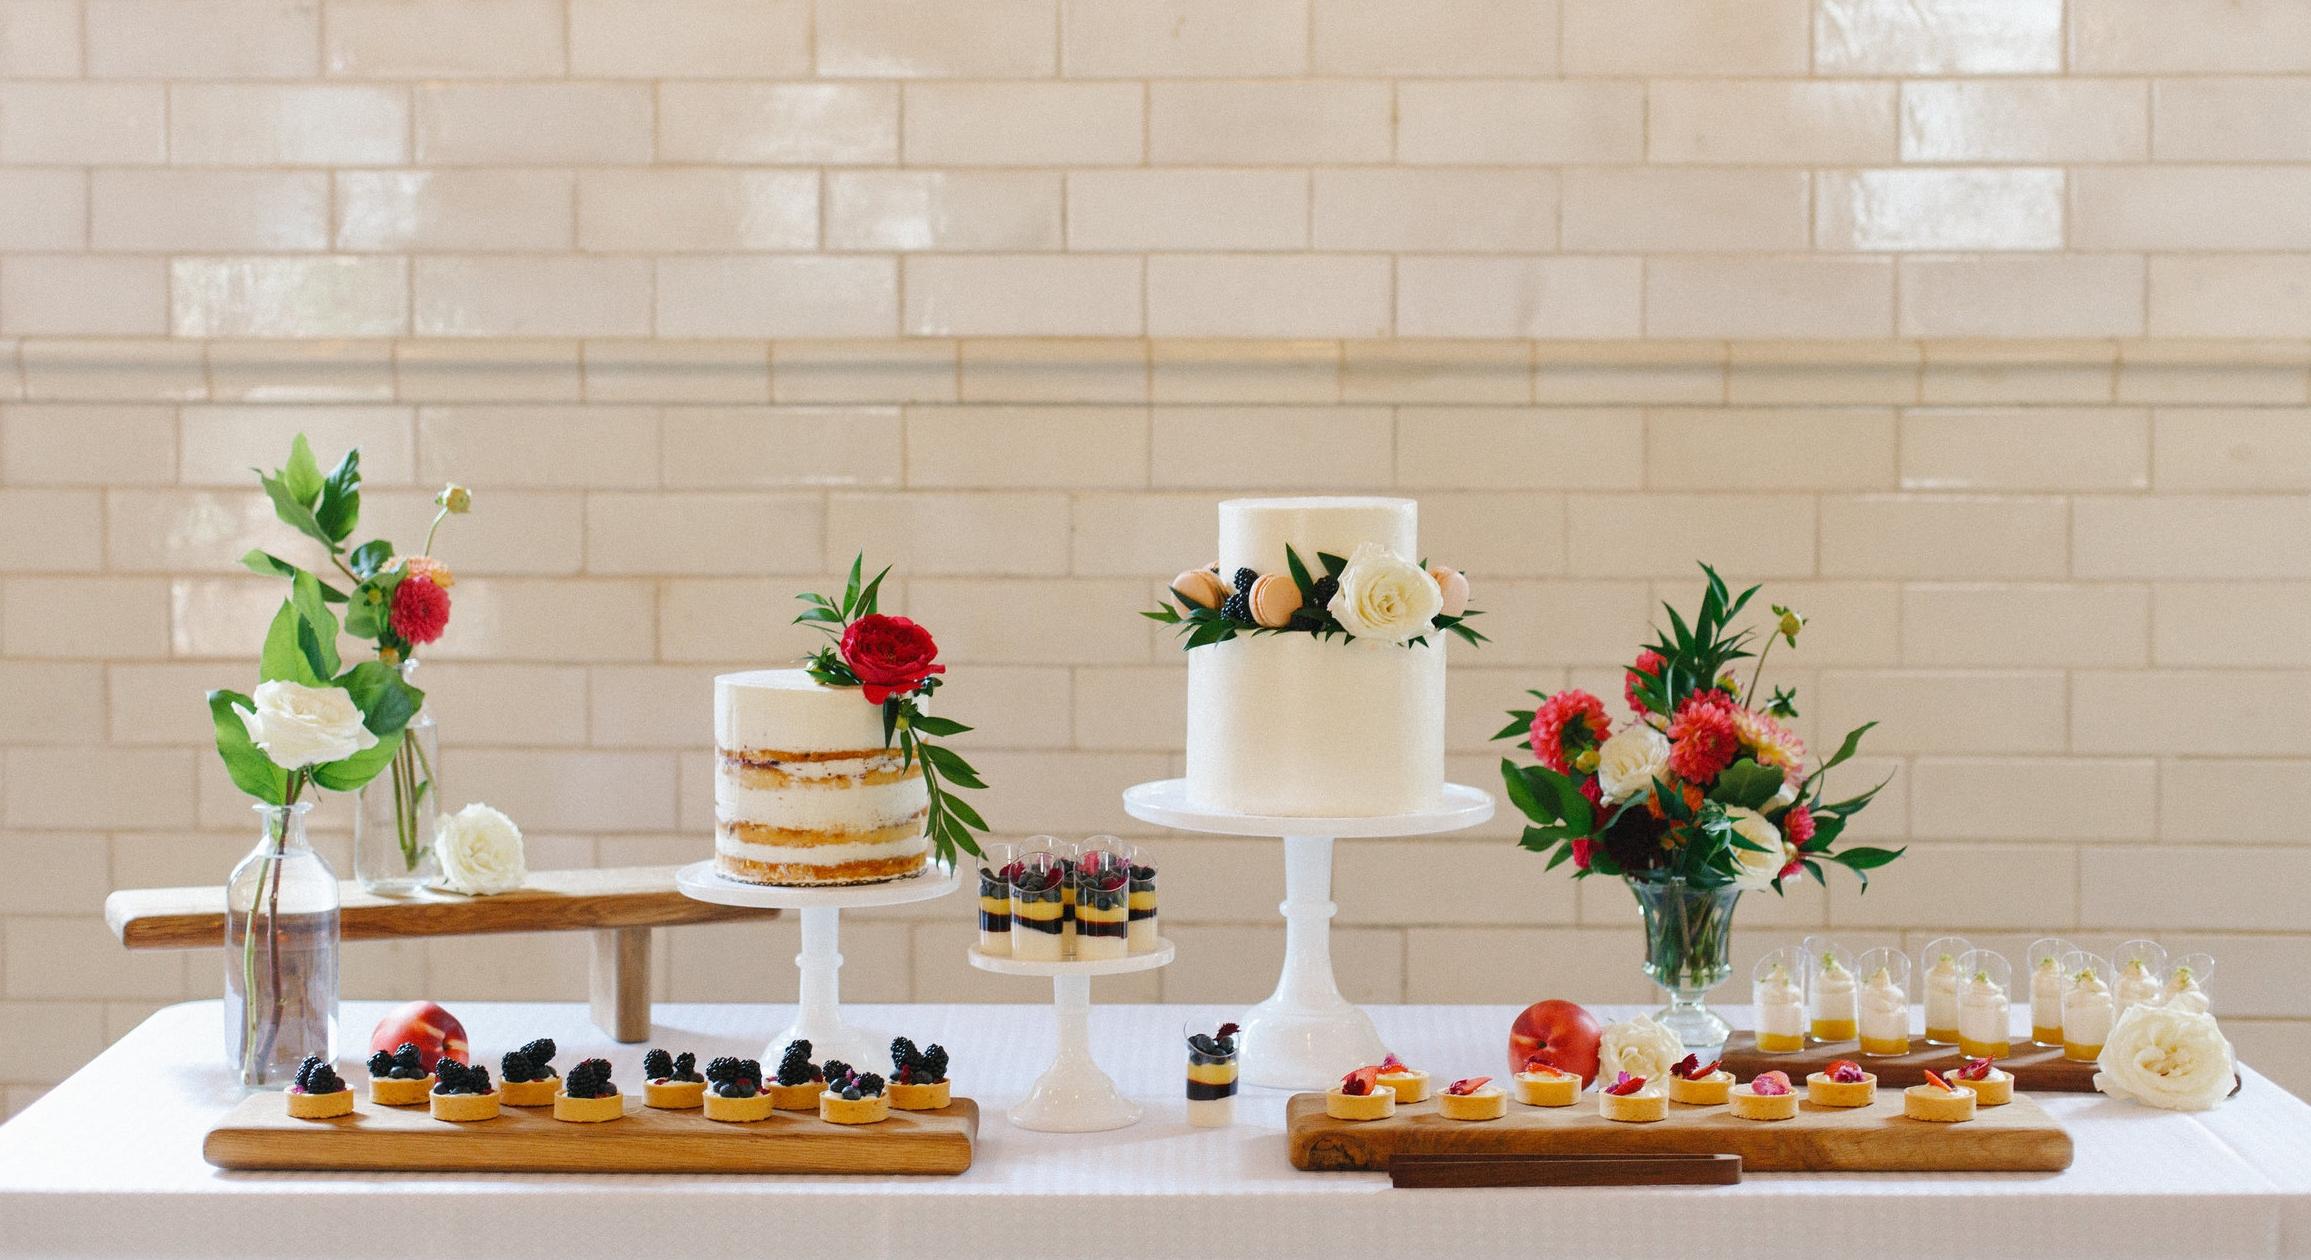 ALTISSIMA CAKE COMPANY, photo by Kina Wicks